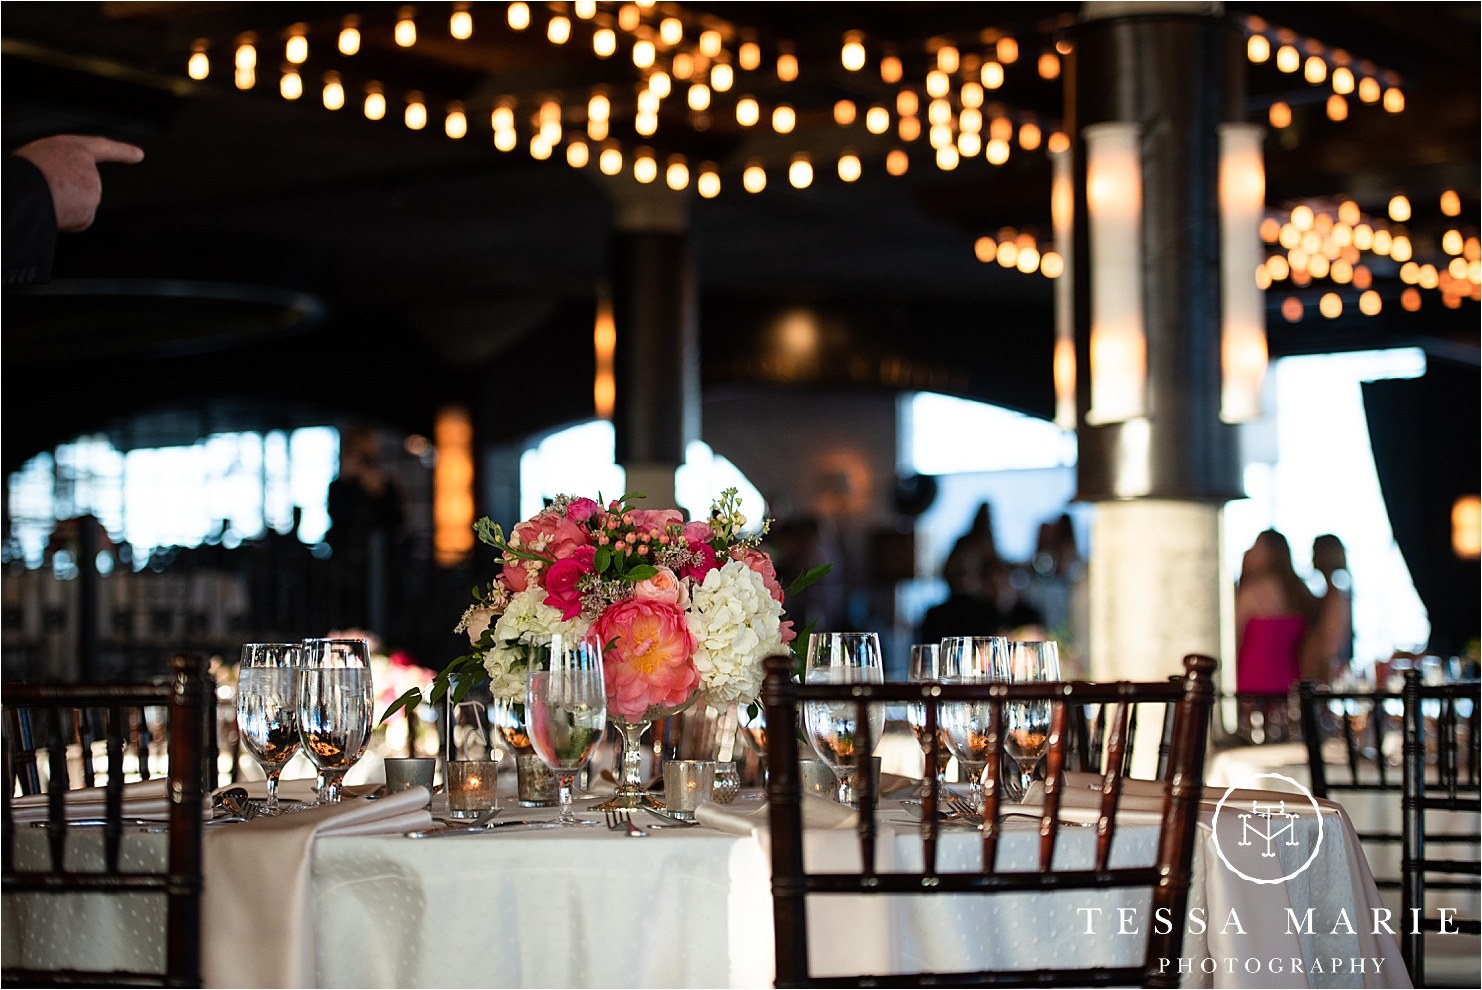 Tessa_marie_weddings_houston_wedding_photographer_The_astorian_0145.jpg